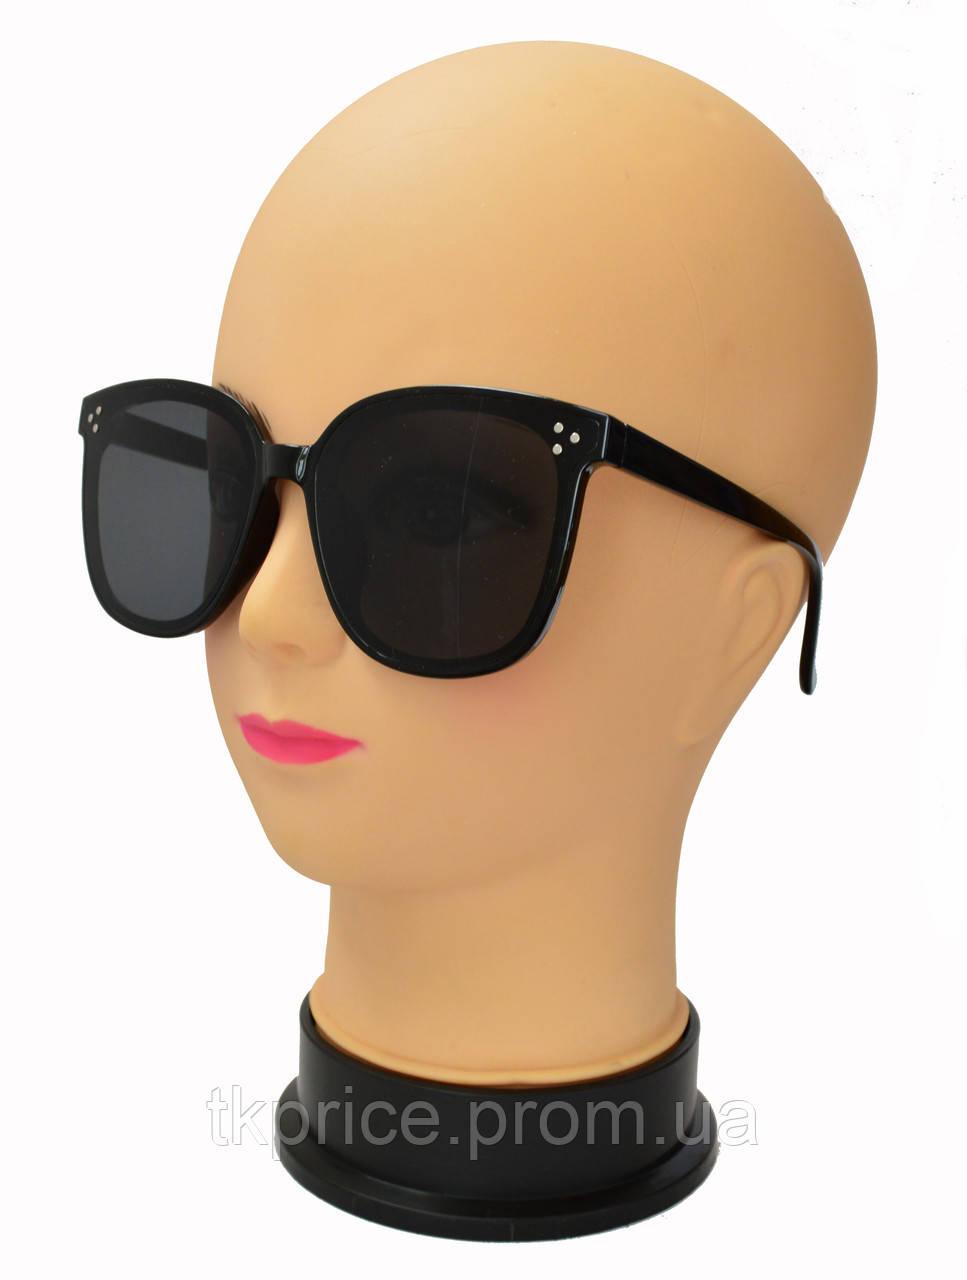 Модные женские солнцезащитные очки 1705,  жіночі сонцезахисні окуляри новинка